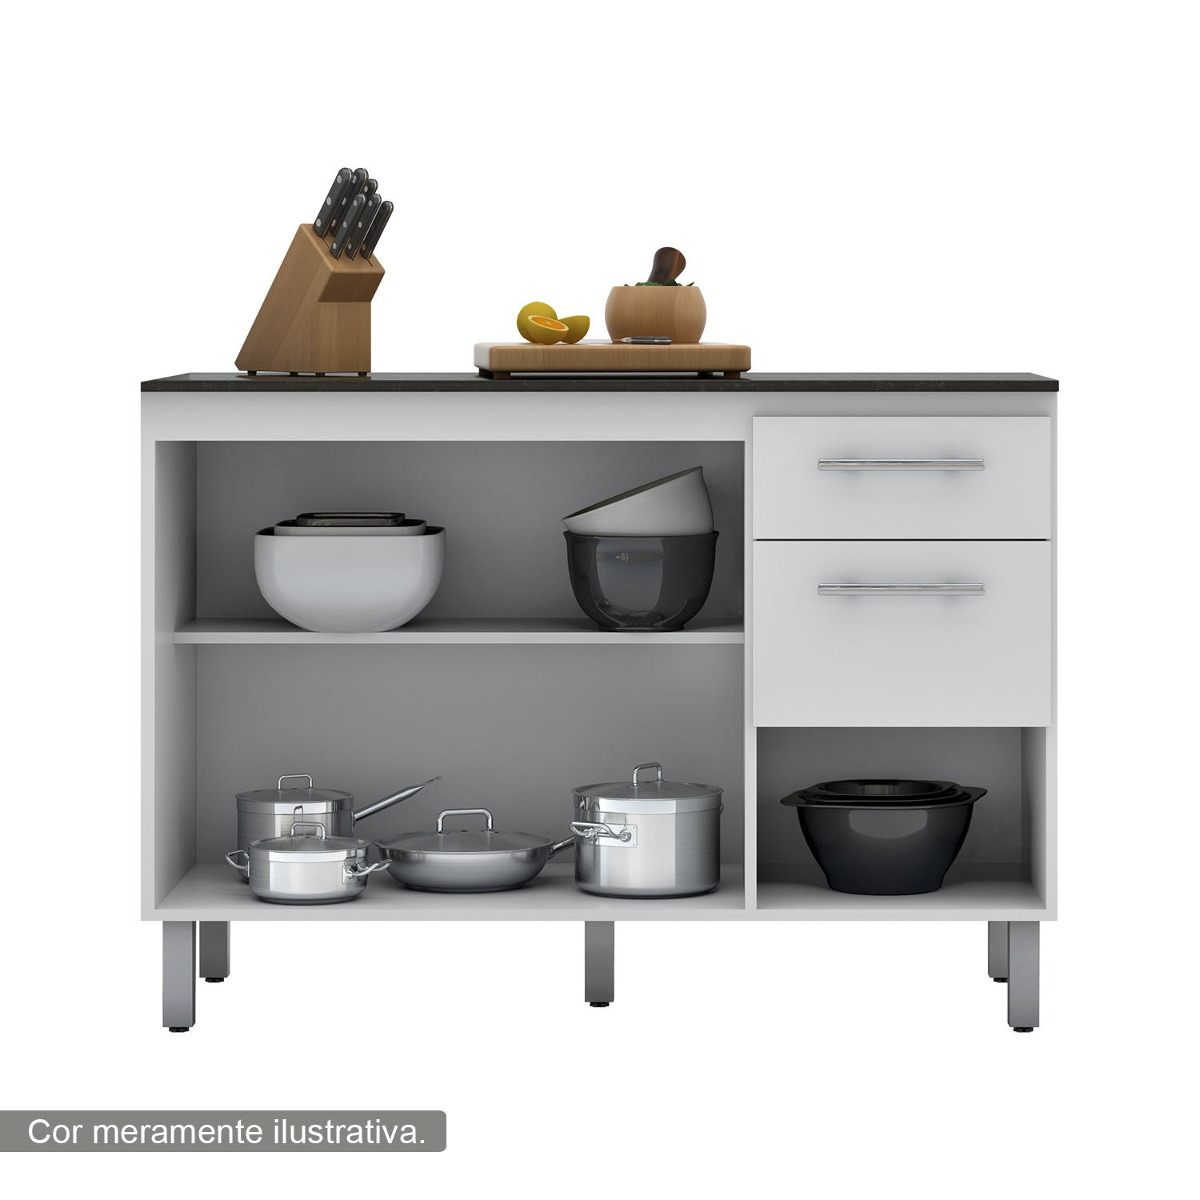 Jogo De Cozinha Mdf Modulado Balco Paneleiro Armario Aereo 120101 #674B2E 1200 1200